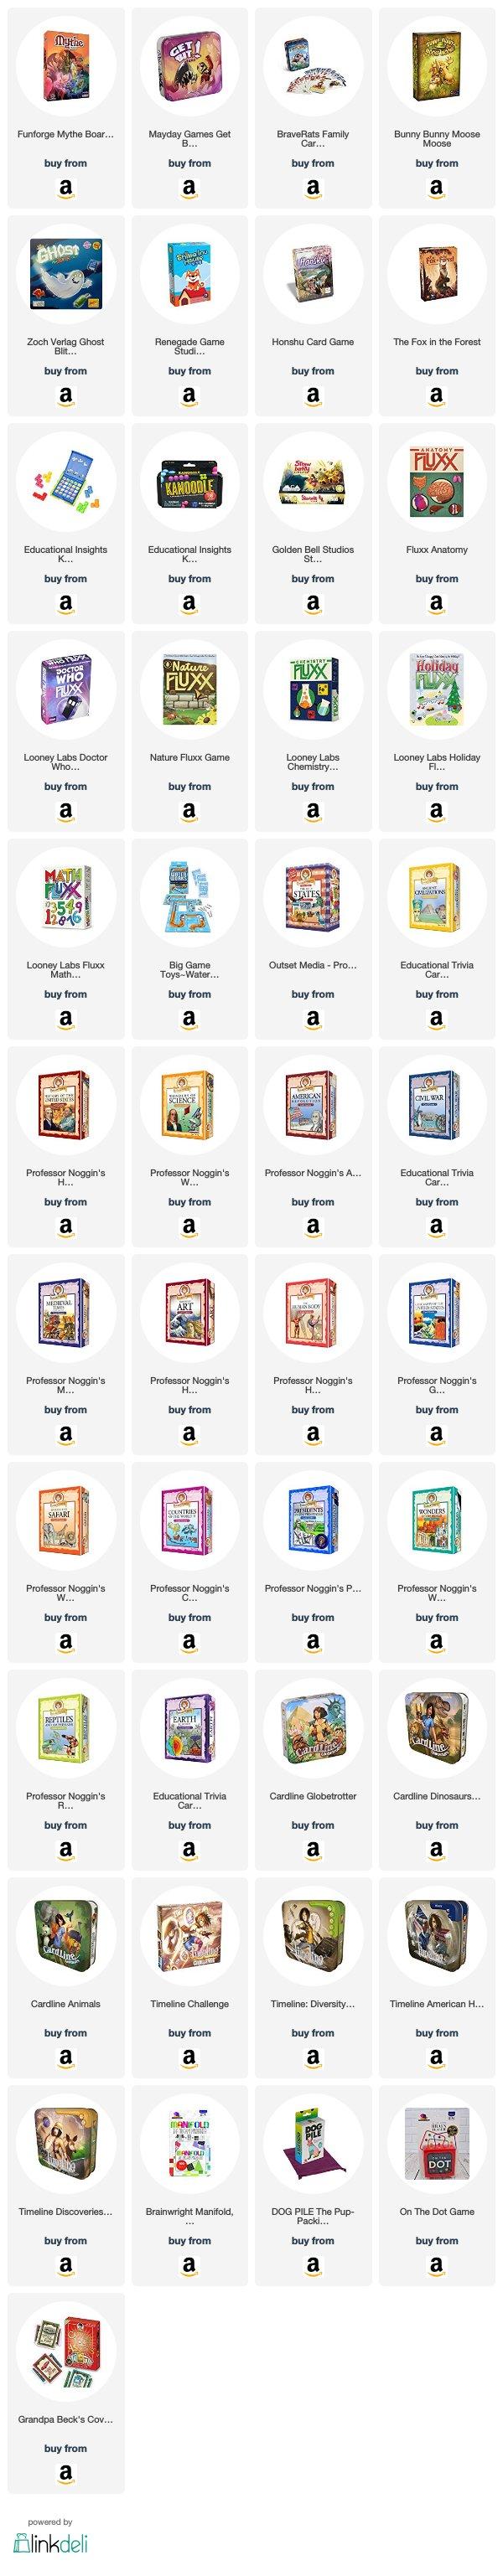 30+ Stocking Stuffer Game Ideas For Kids